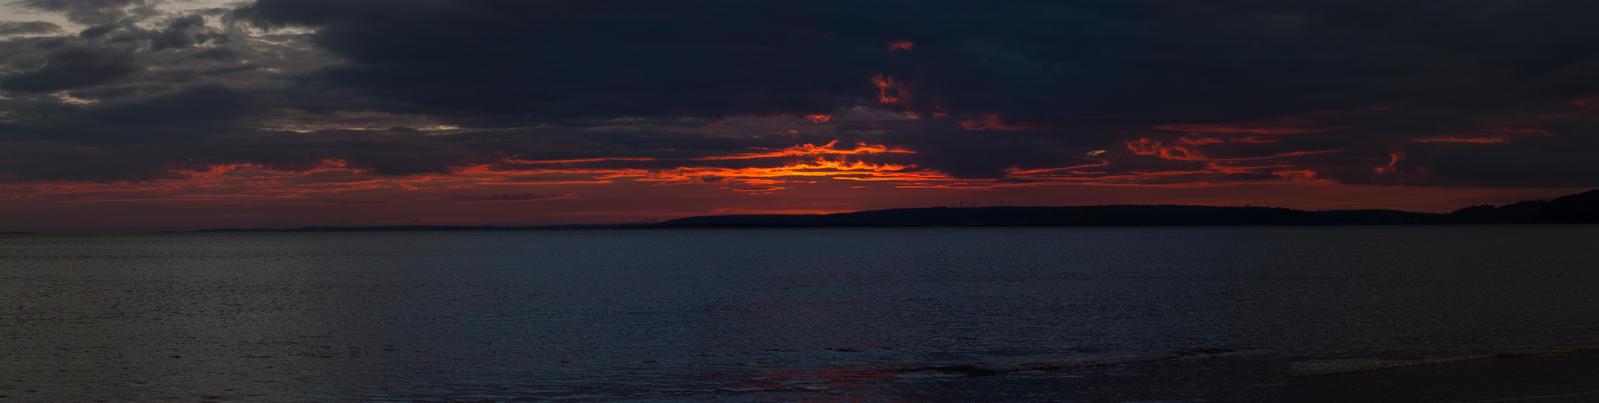 Wednesday's Sky by drevan